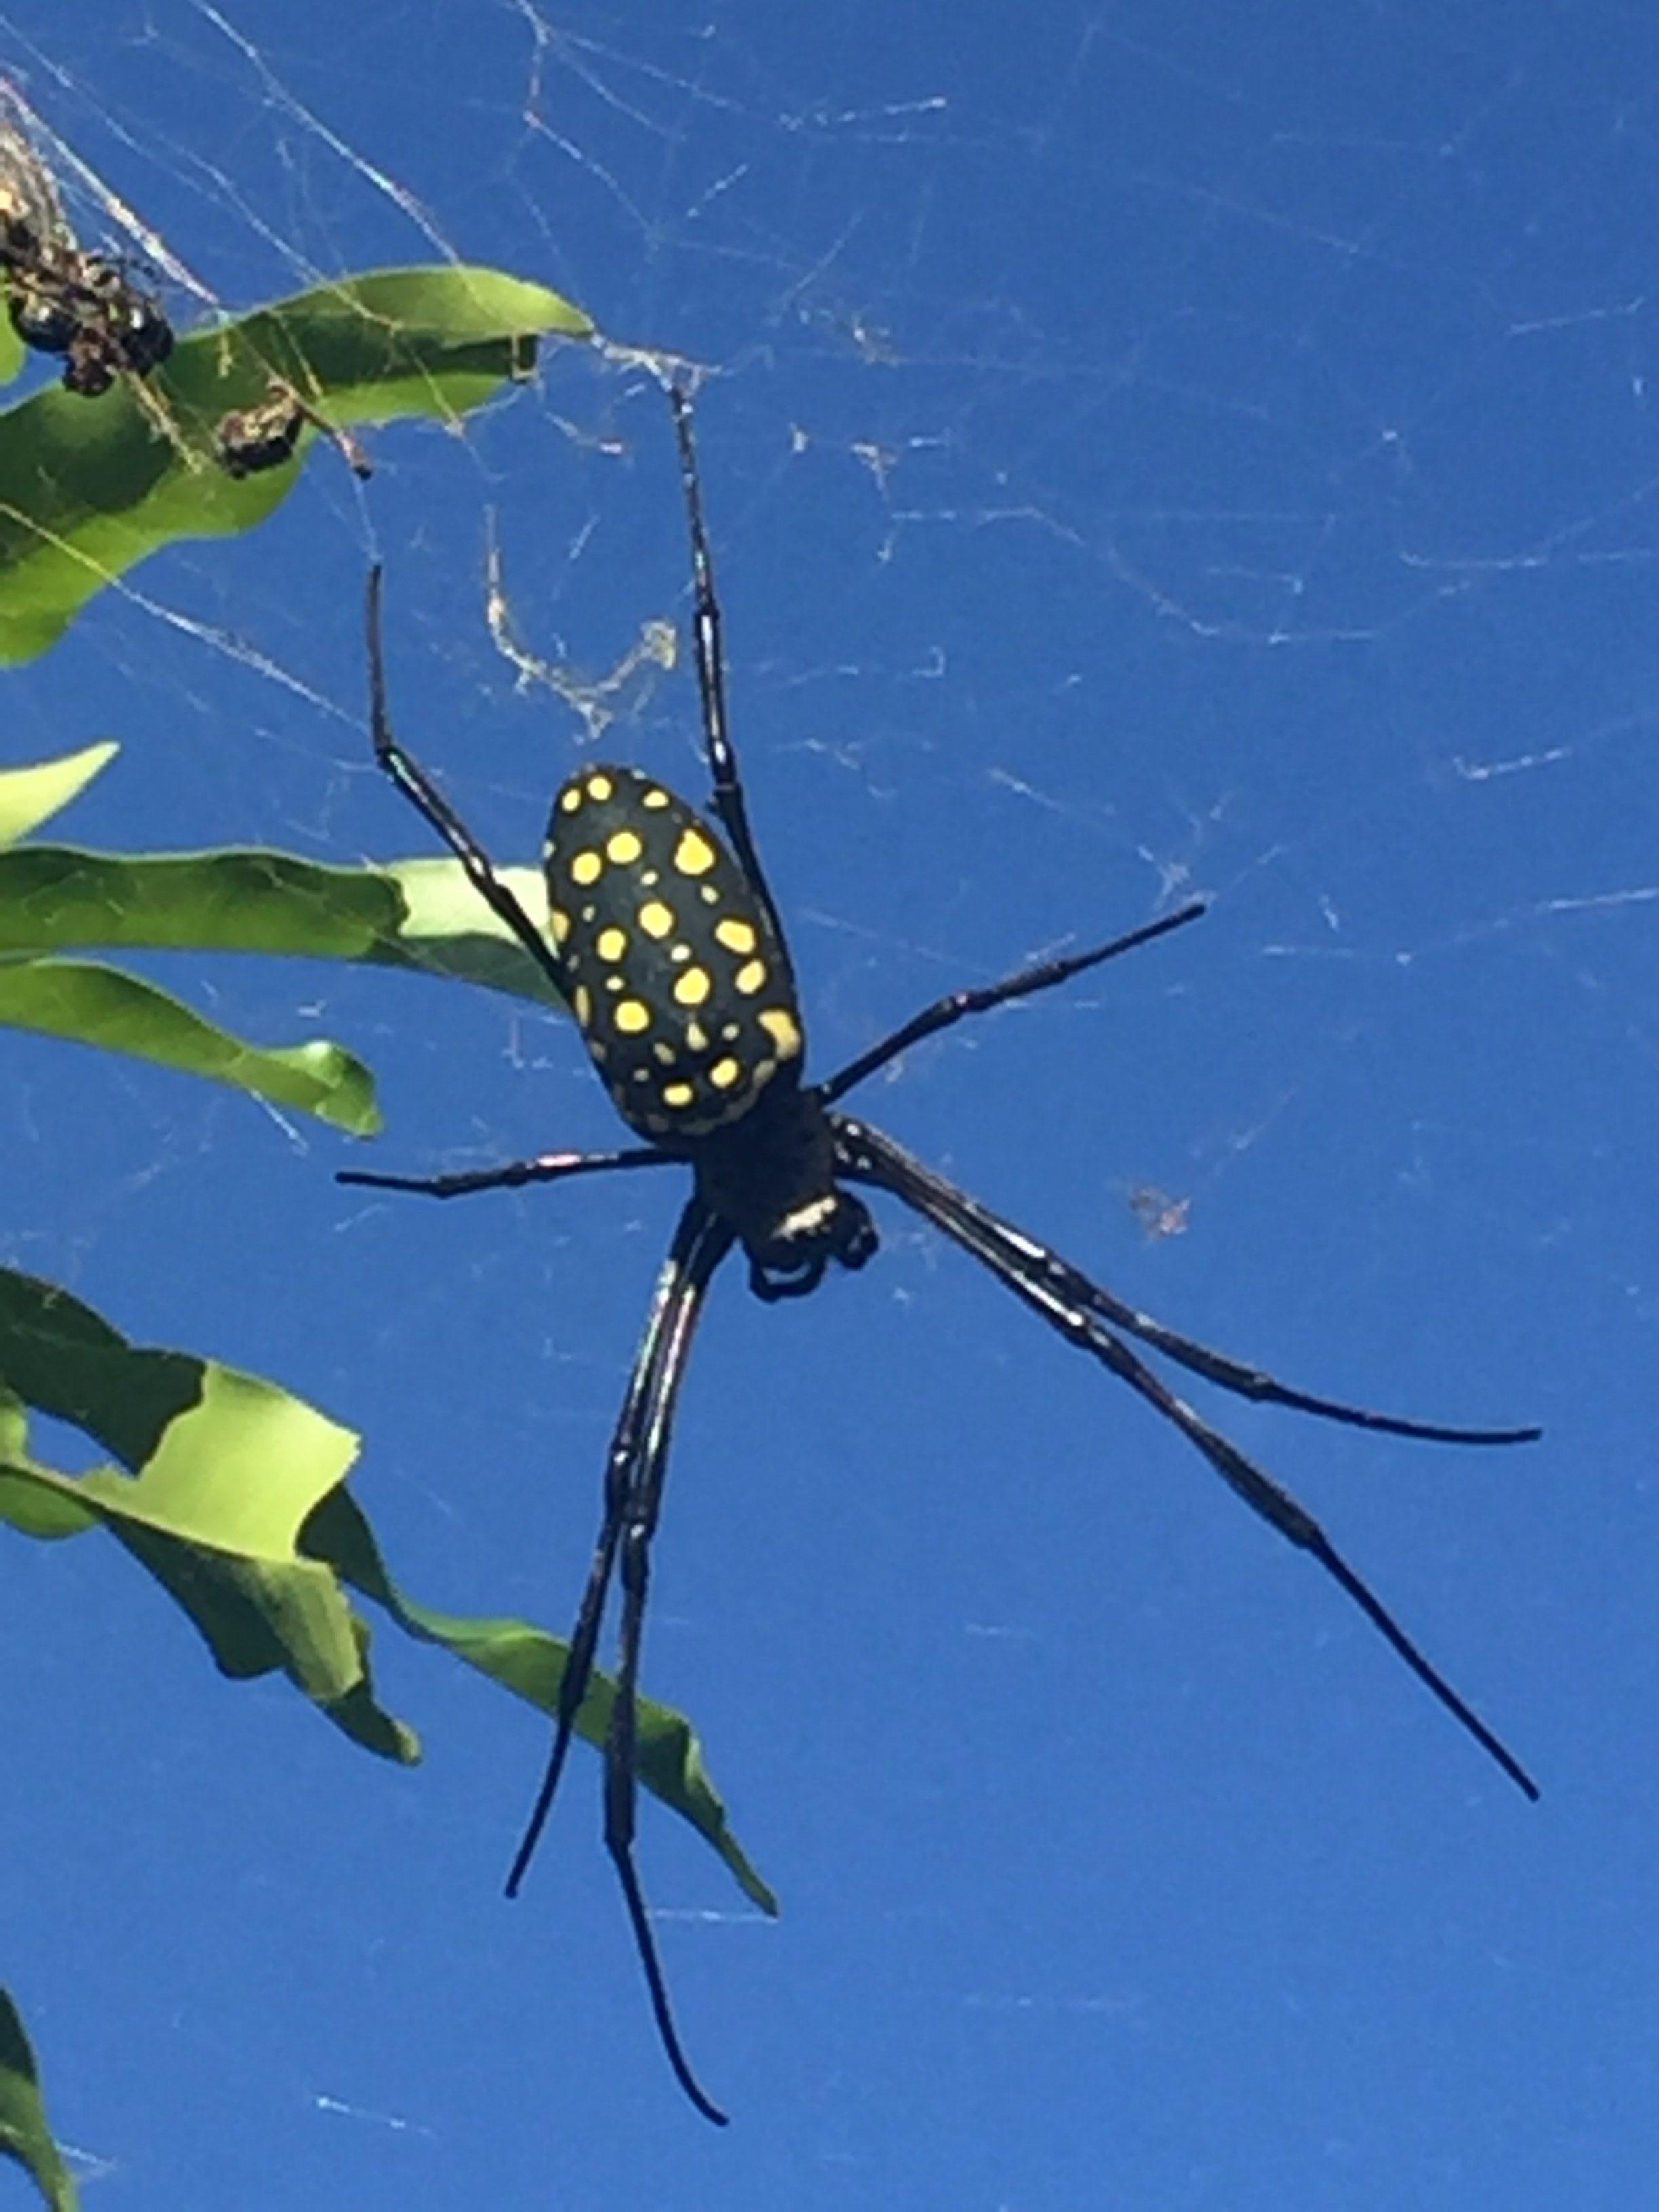 Picture of Trichonephila antipodiana (Batik Golden Web Spider) - Female - Dorsal,Webs